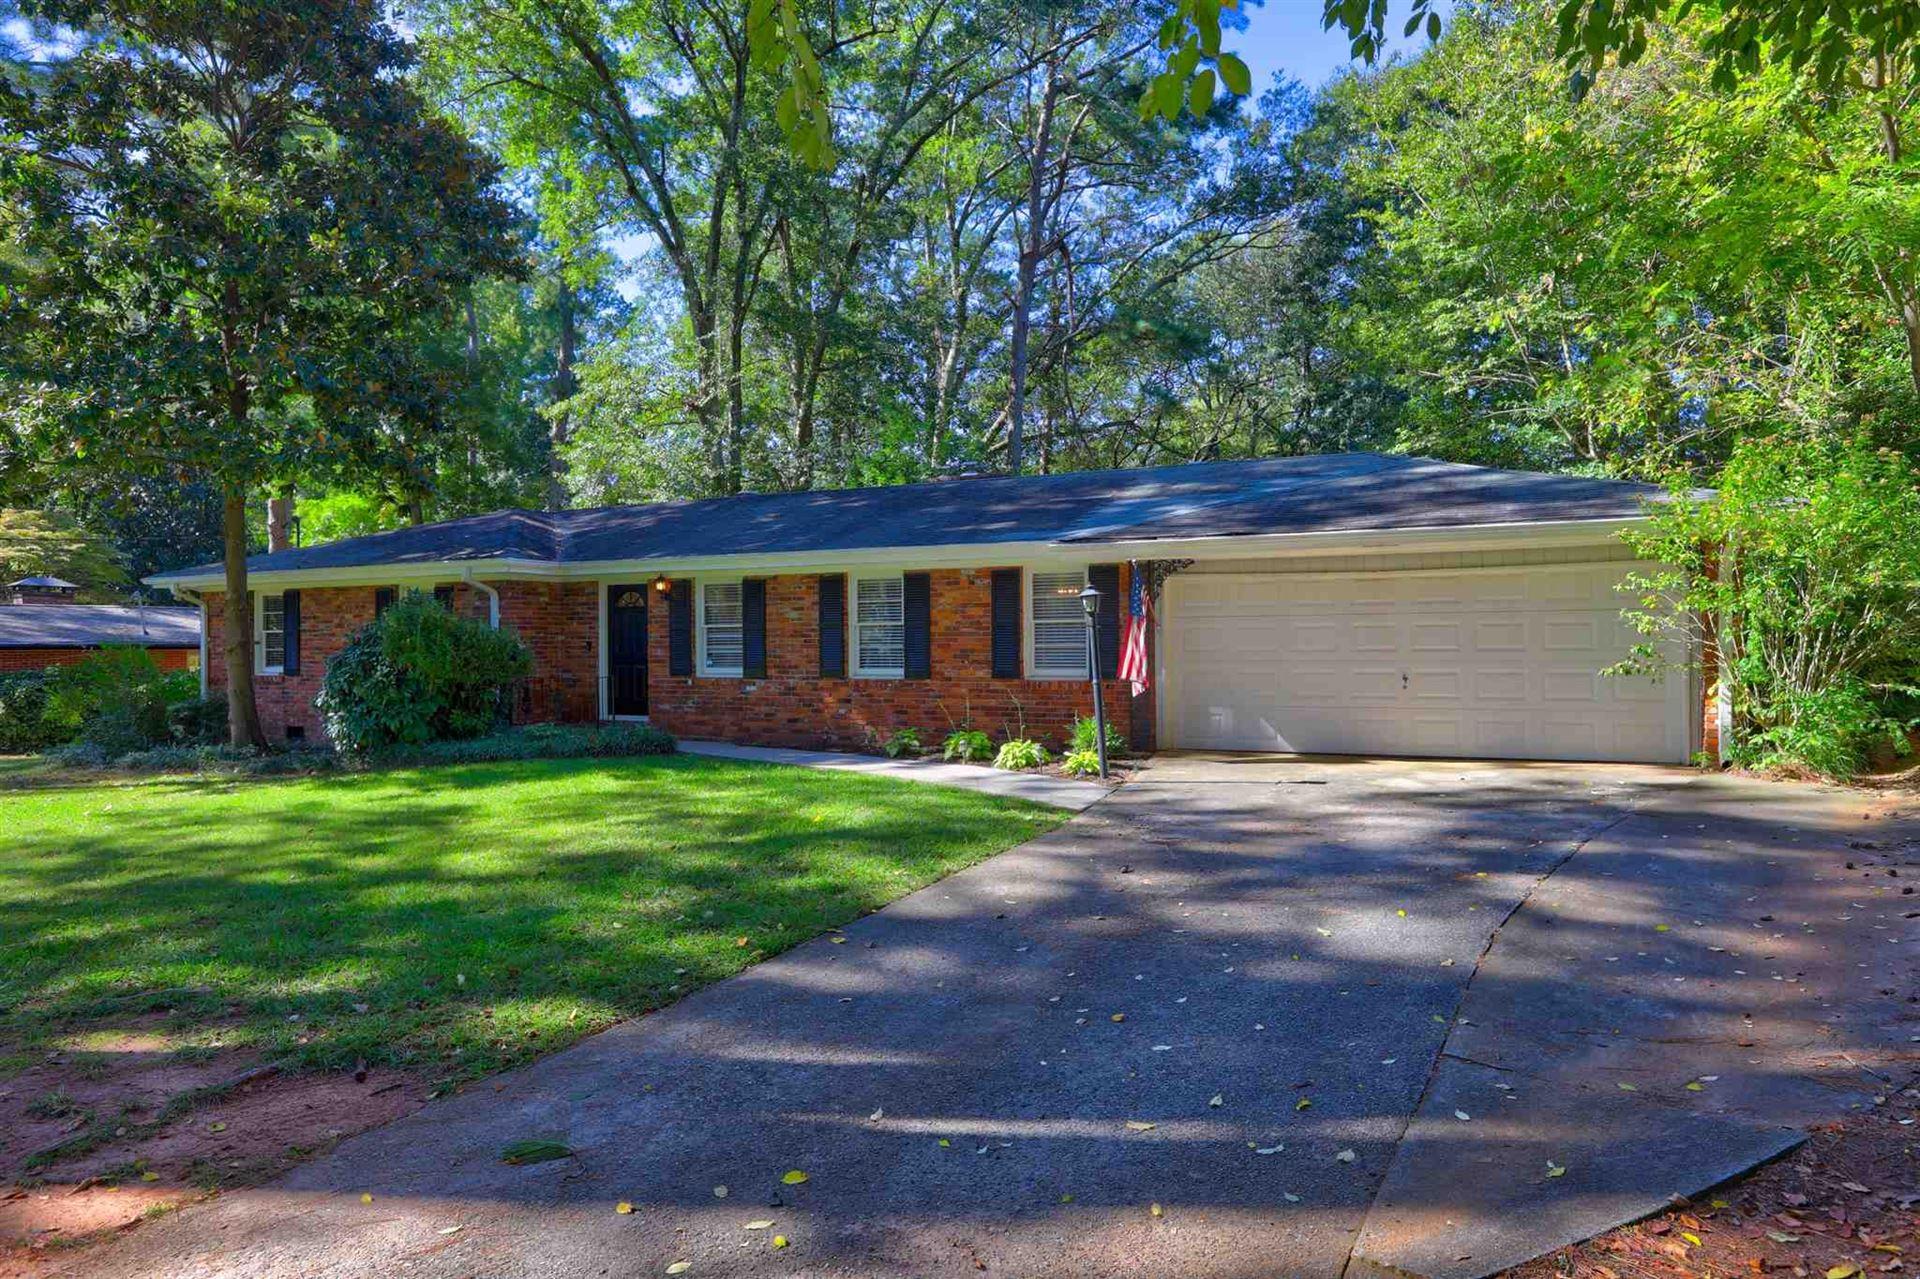 135 Elaine, Roswell, GA 30075 - MLS#: 8874254